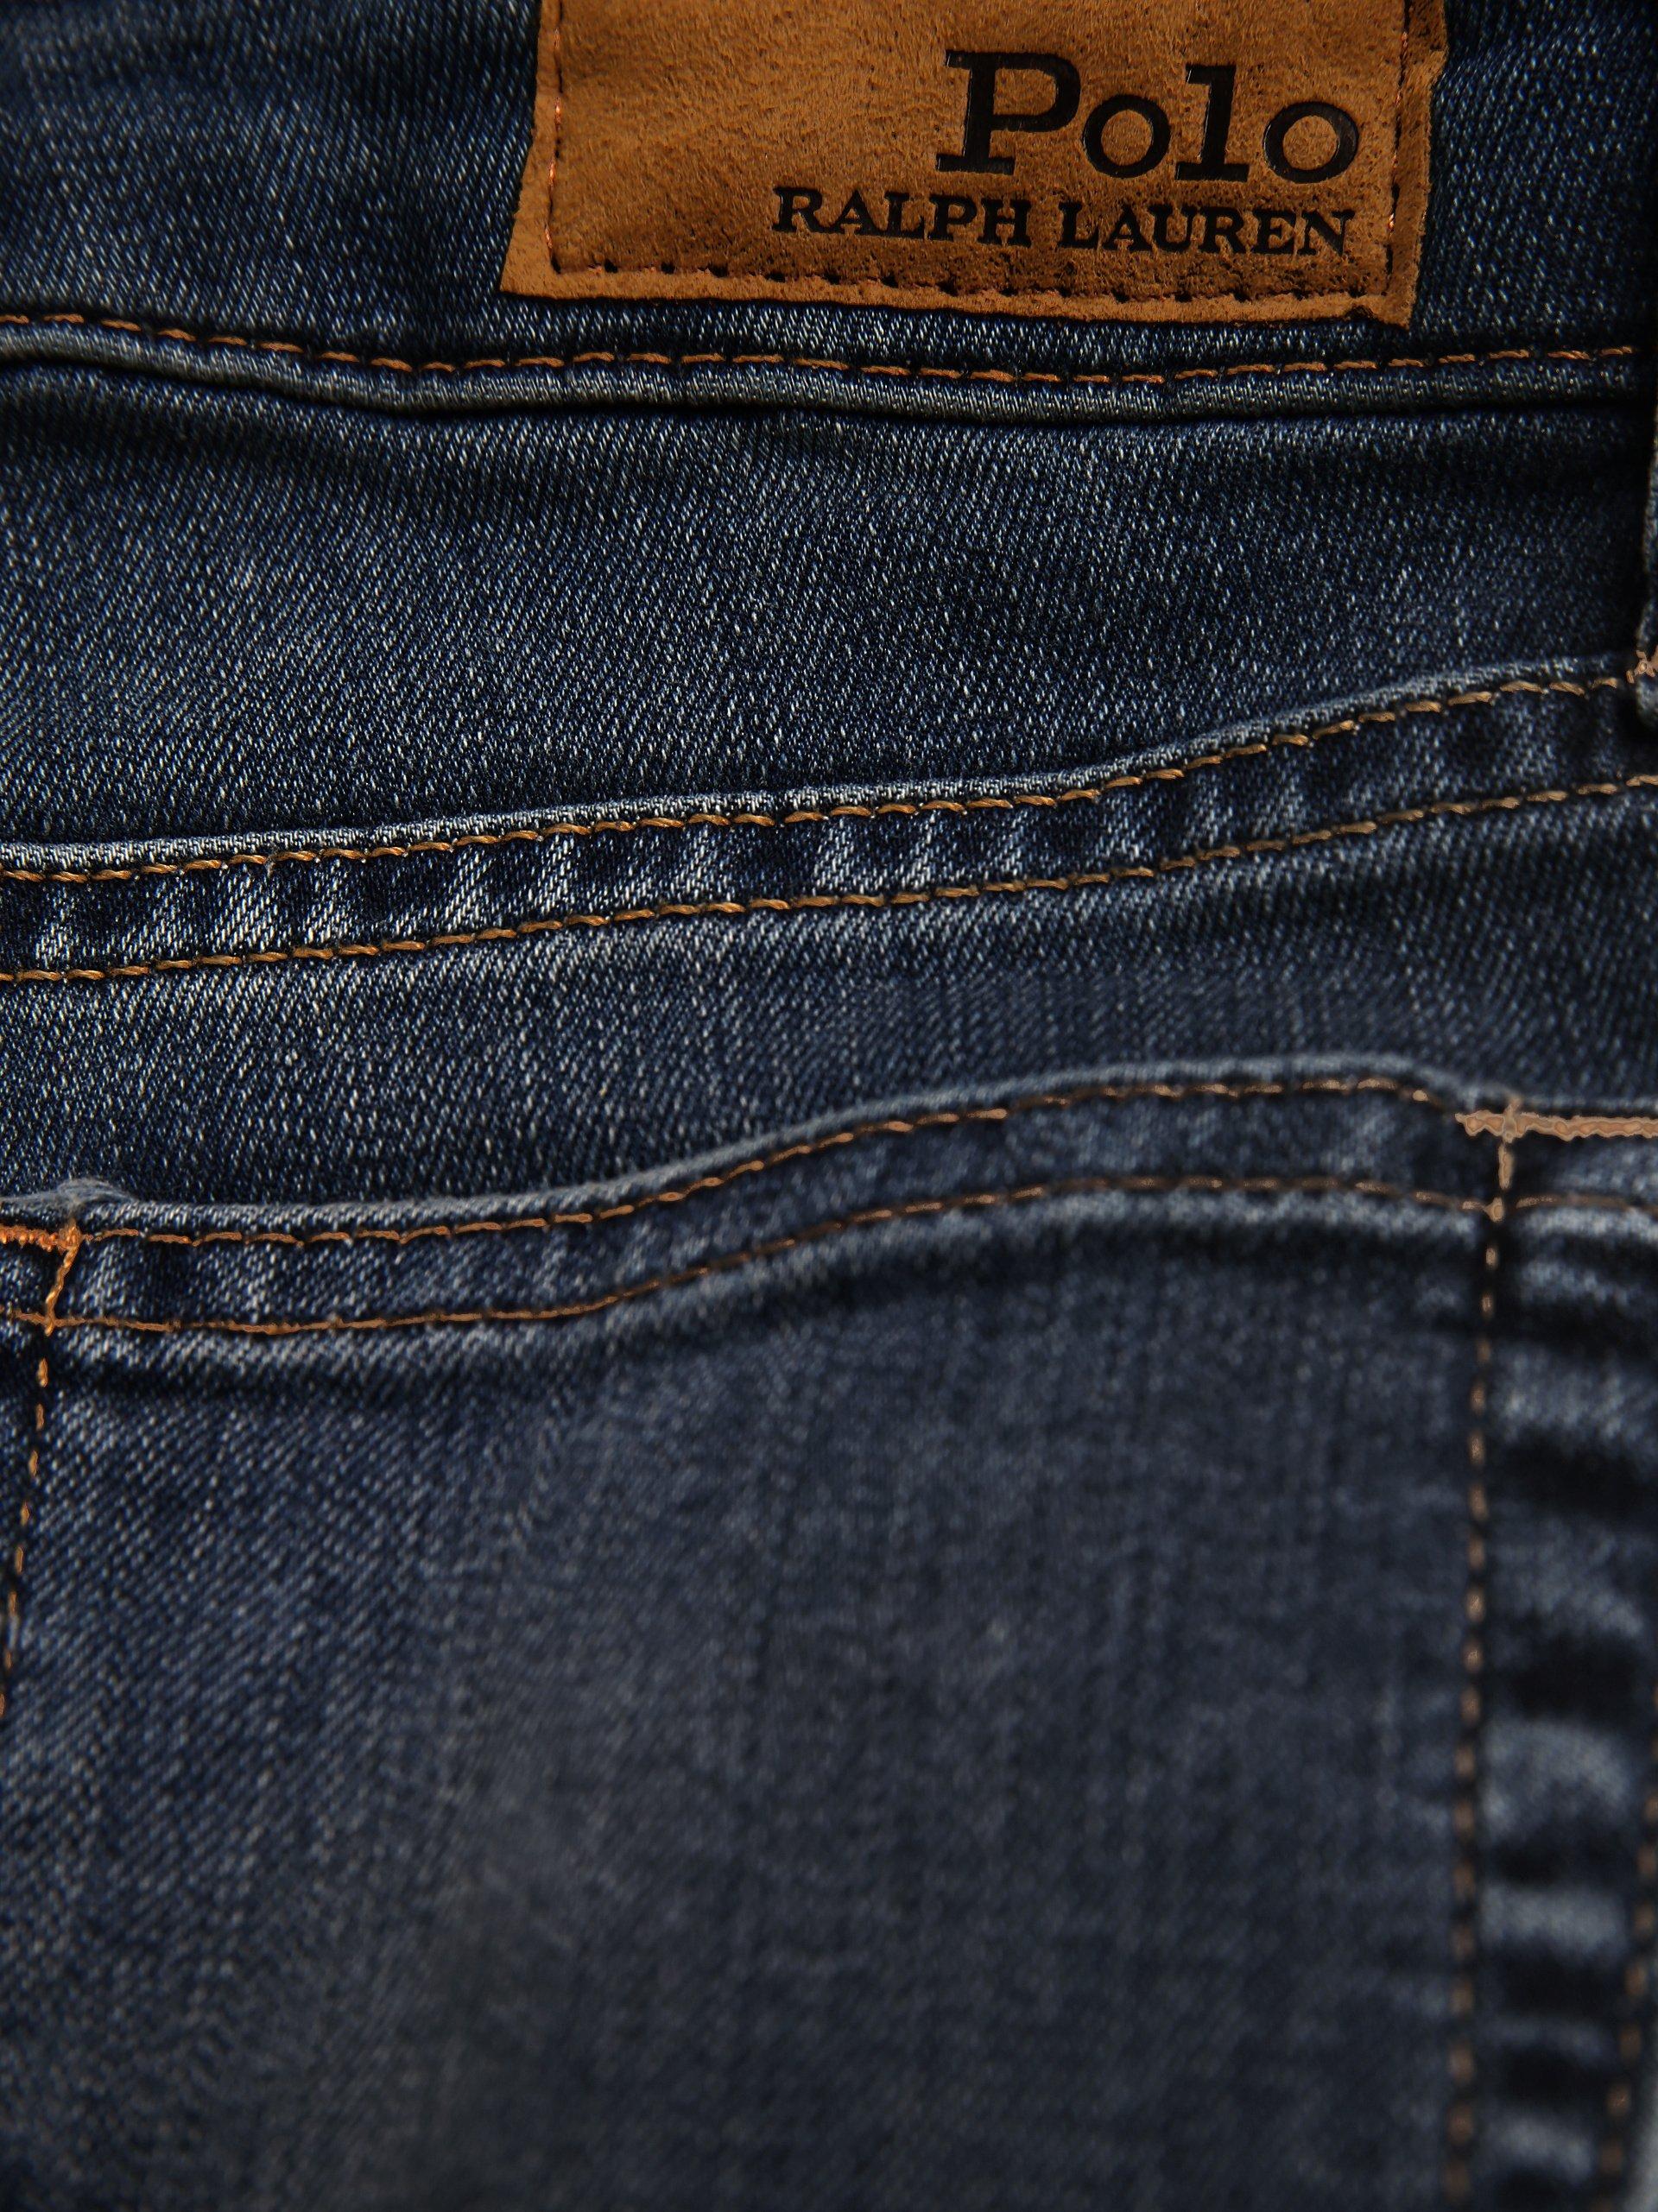 Polo Ralph Lauren Mädchen Jeans